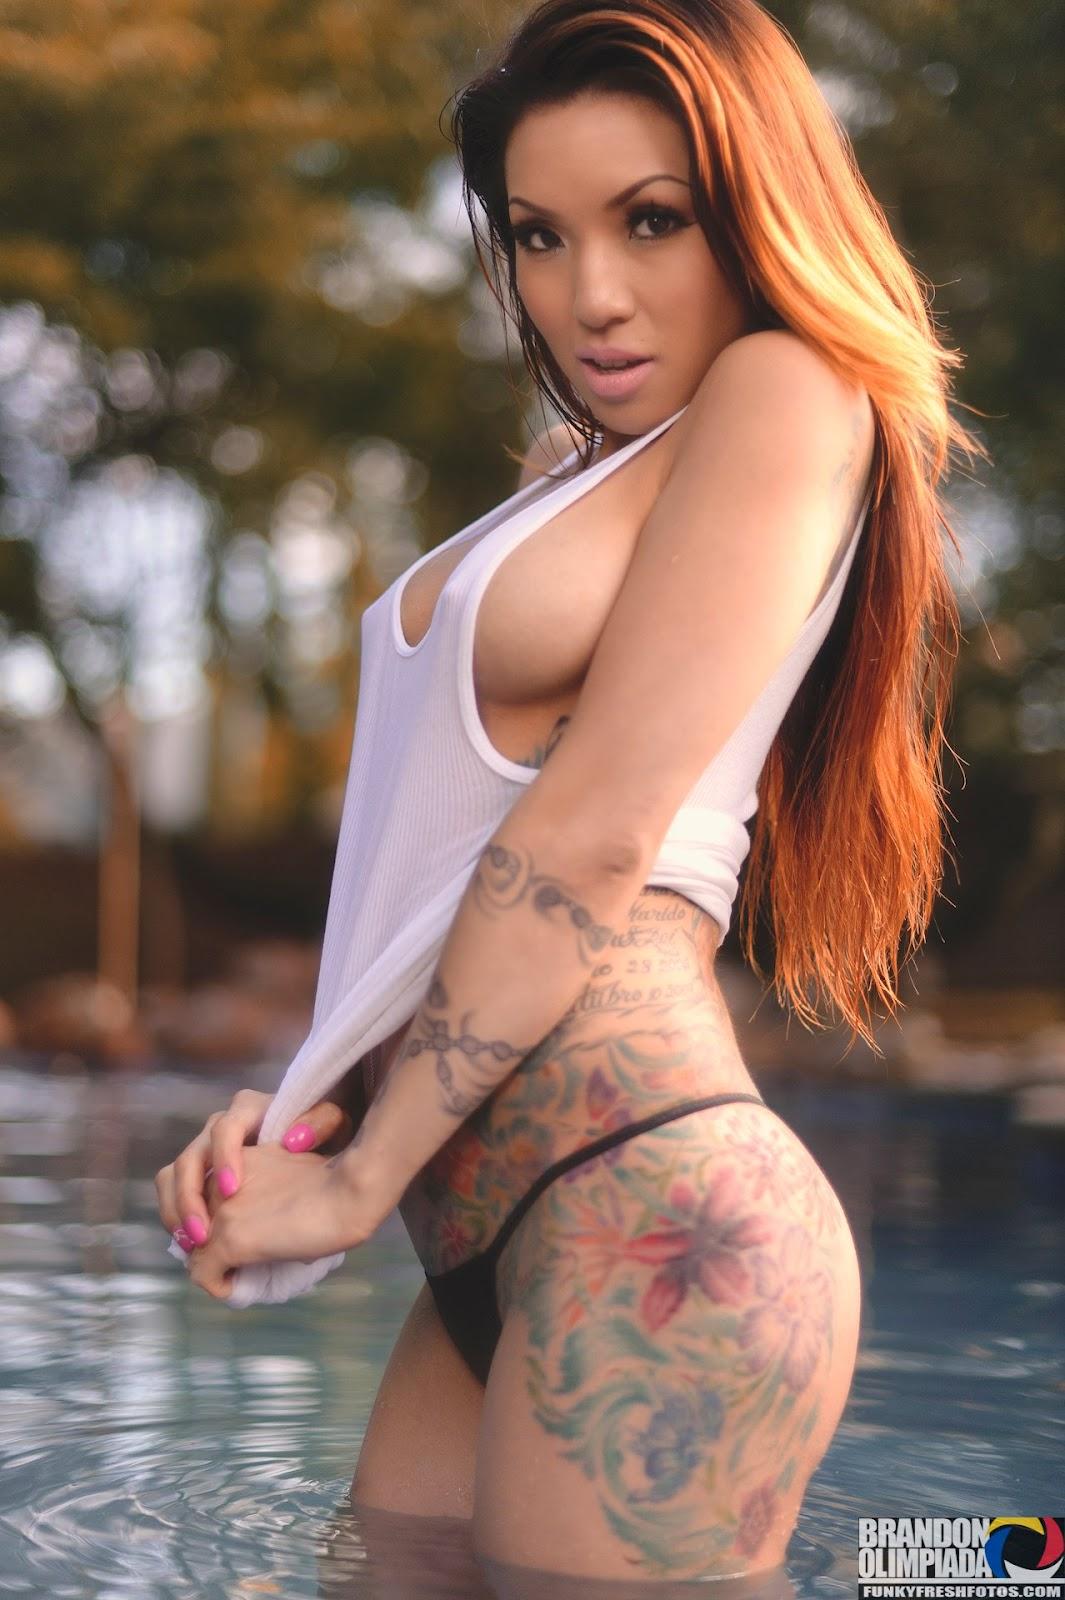 Lady's Magazine: Sexy Tattoo